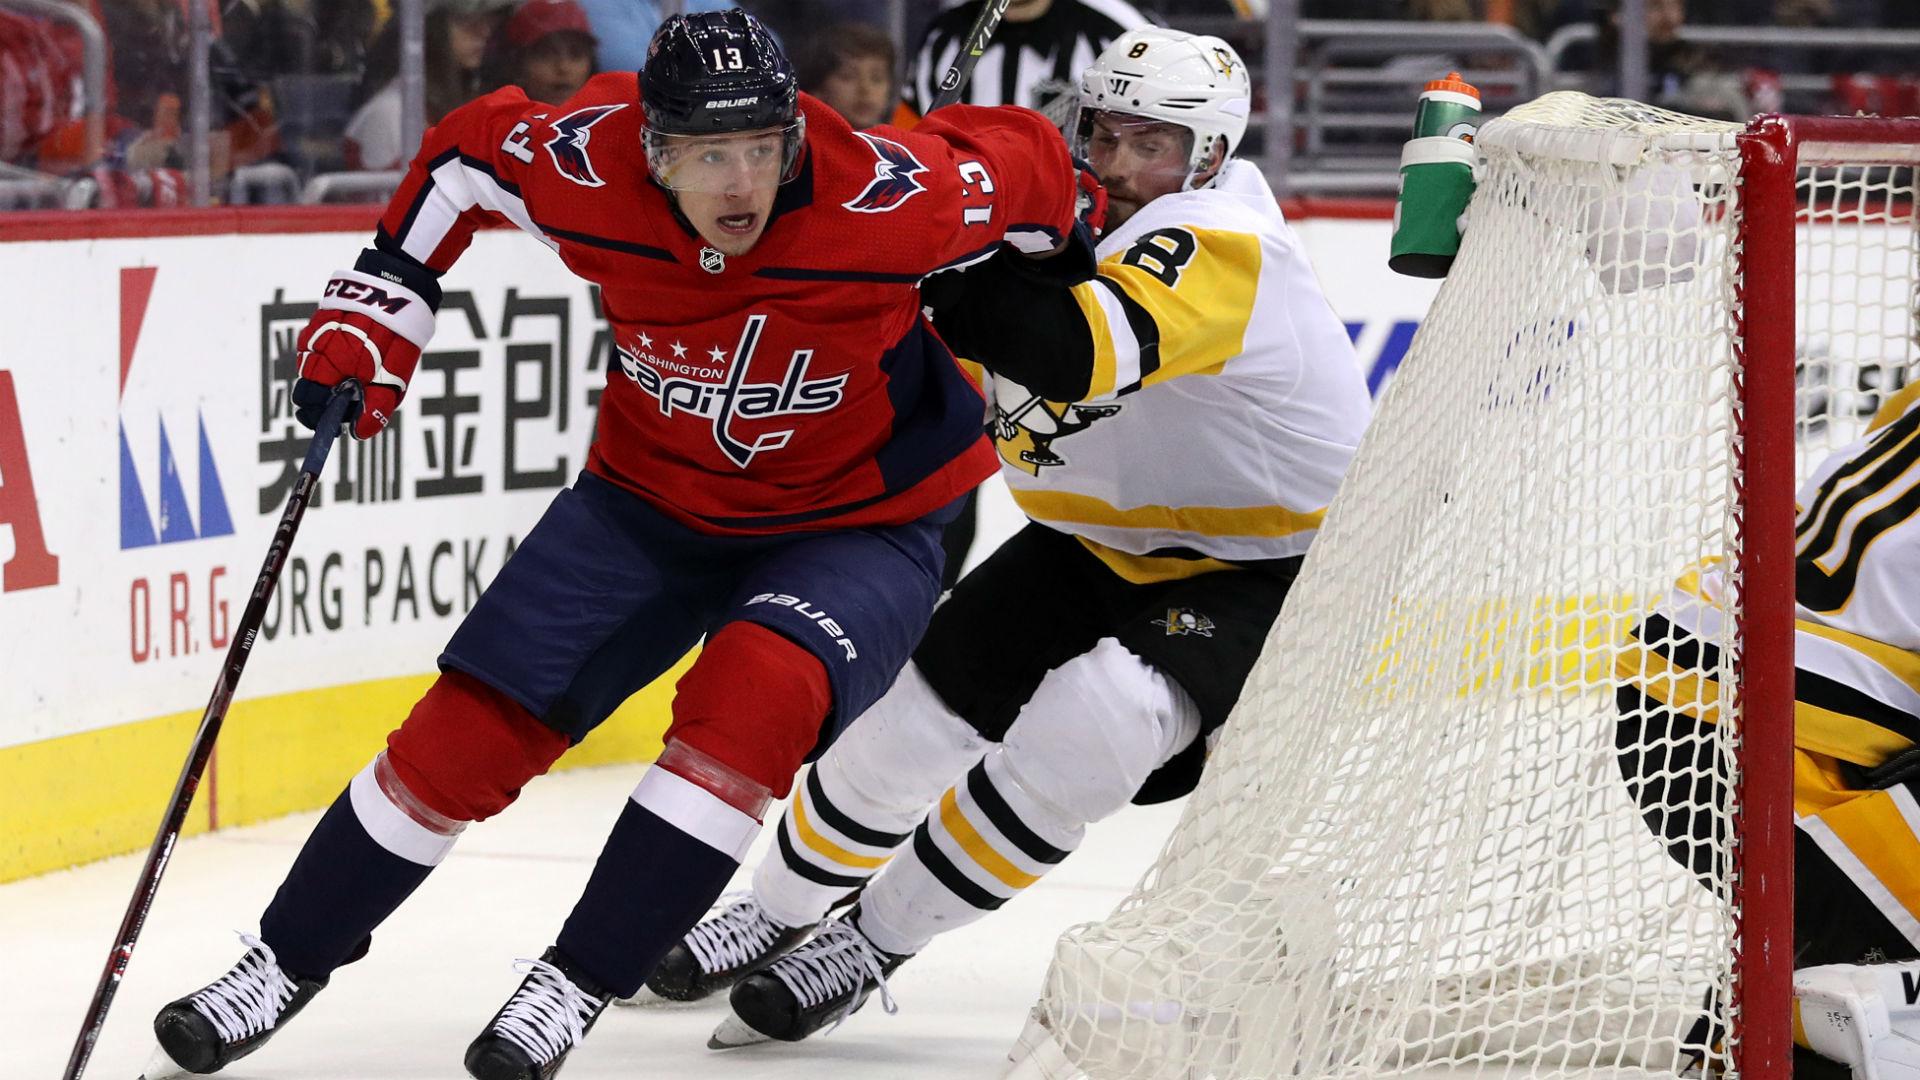 NHL playoffs 2018: Capitals' Jakub Vrana nets Game 5 winner, pushes Penguins to brink